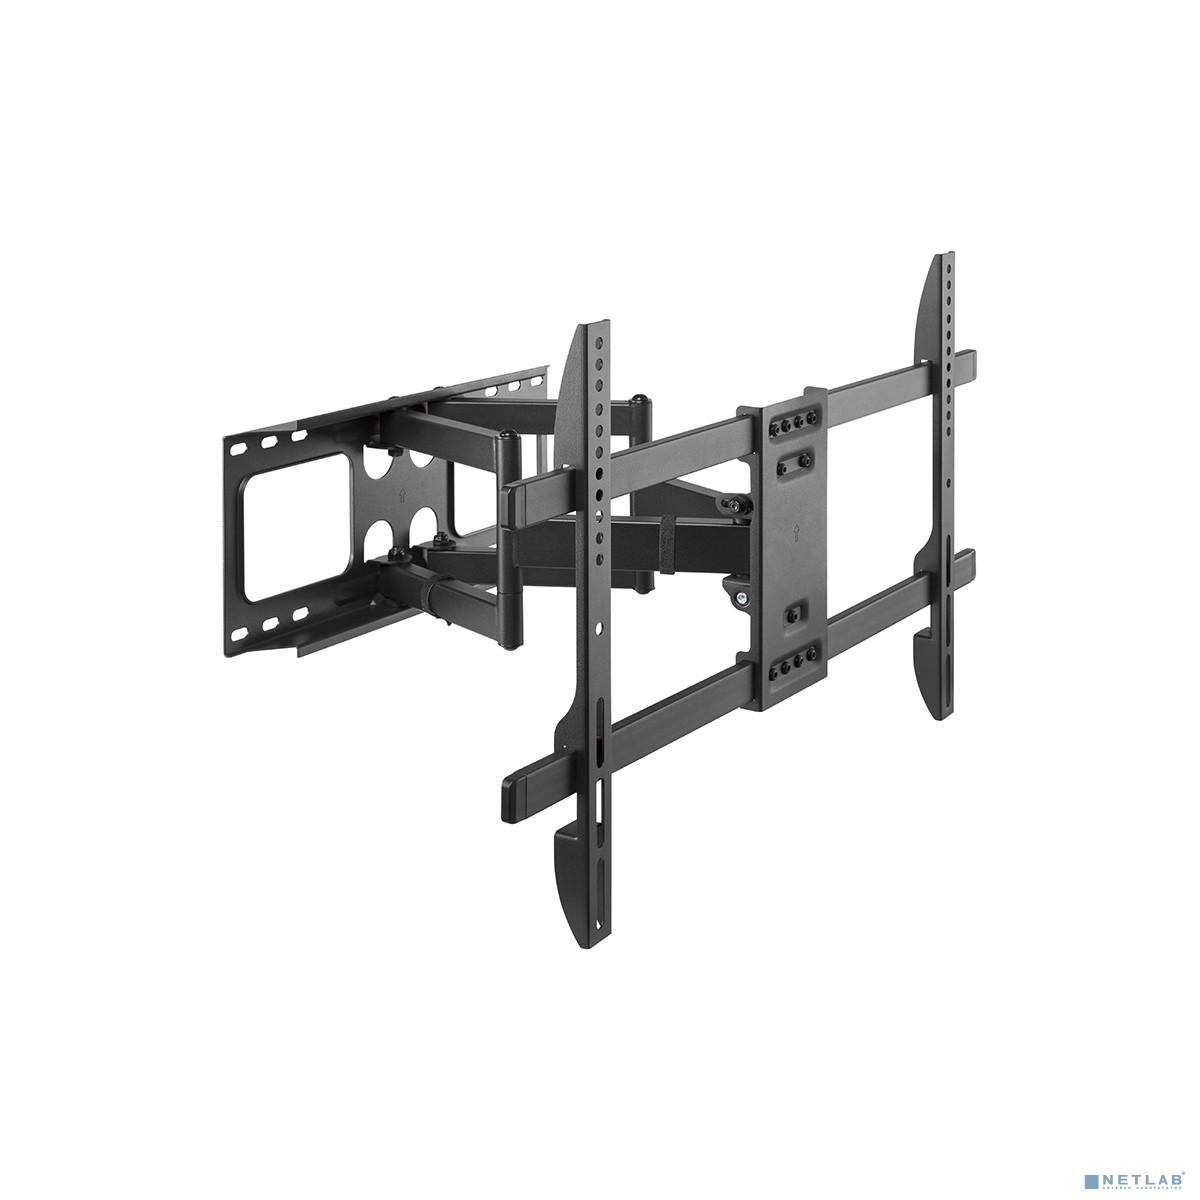 Крепеж HARPER TVFW-70 37-80; Максимальный вес ТВ: 60 кг.; Крепление стандарта Vesa: до 600х400; Типы VESA: 200x200/300x200/300x300/400x200/400x300/400x400/600x400; Угол наклона: -15°+5°